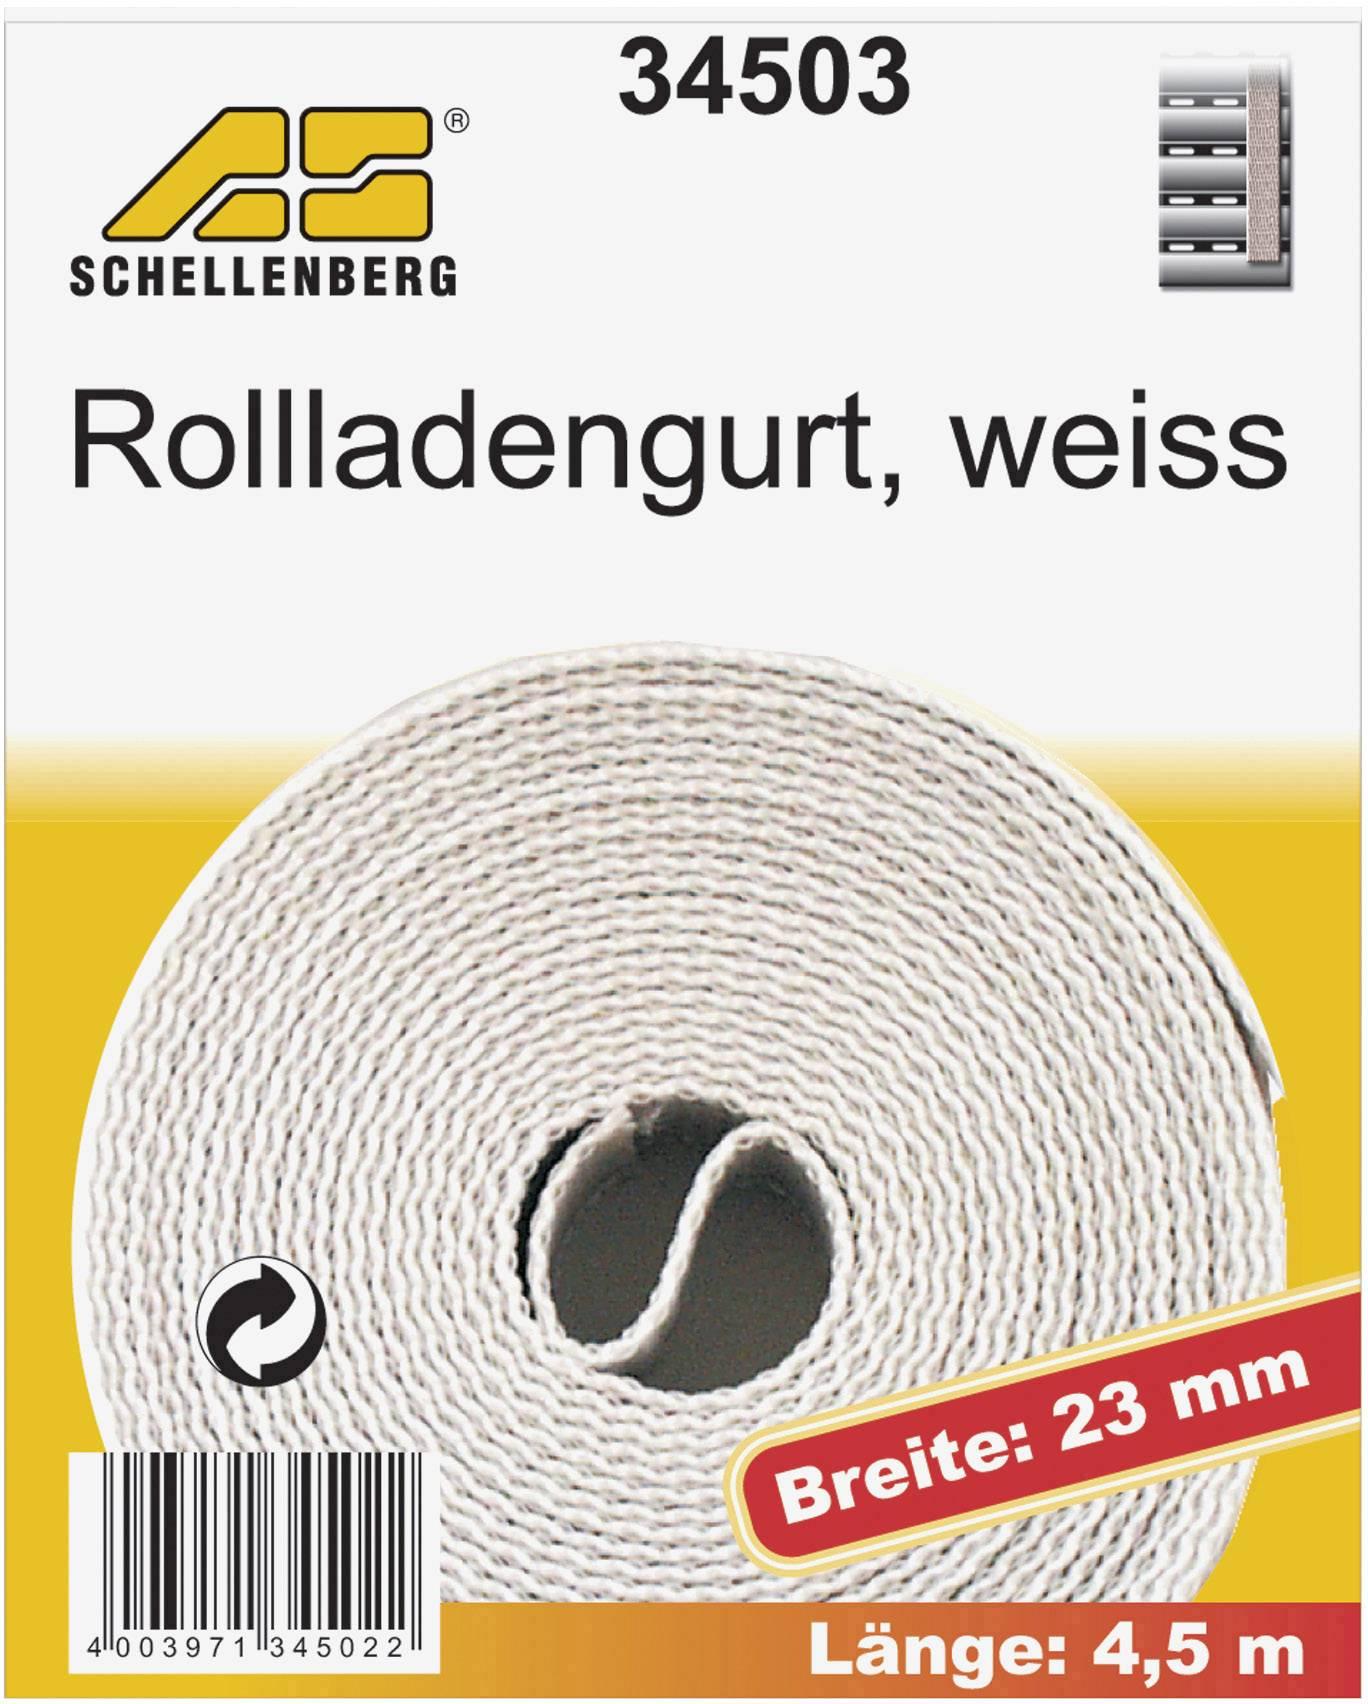 Popruhy pre rolety Schellenberg 34503, 4.5 m, biela, vhodné pre Schellenberg Maxi